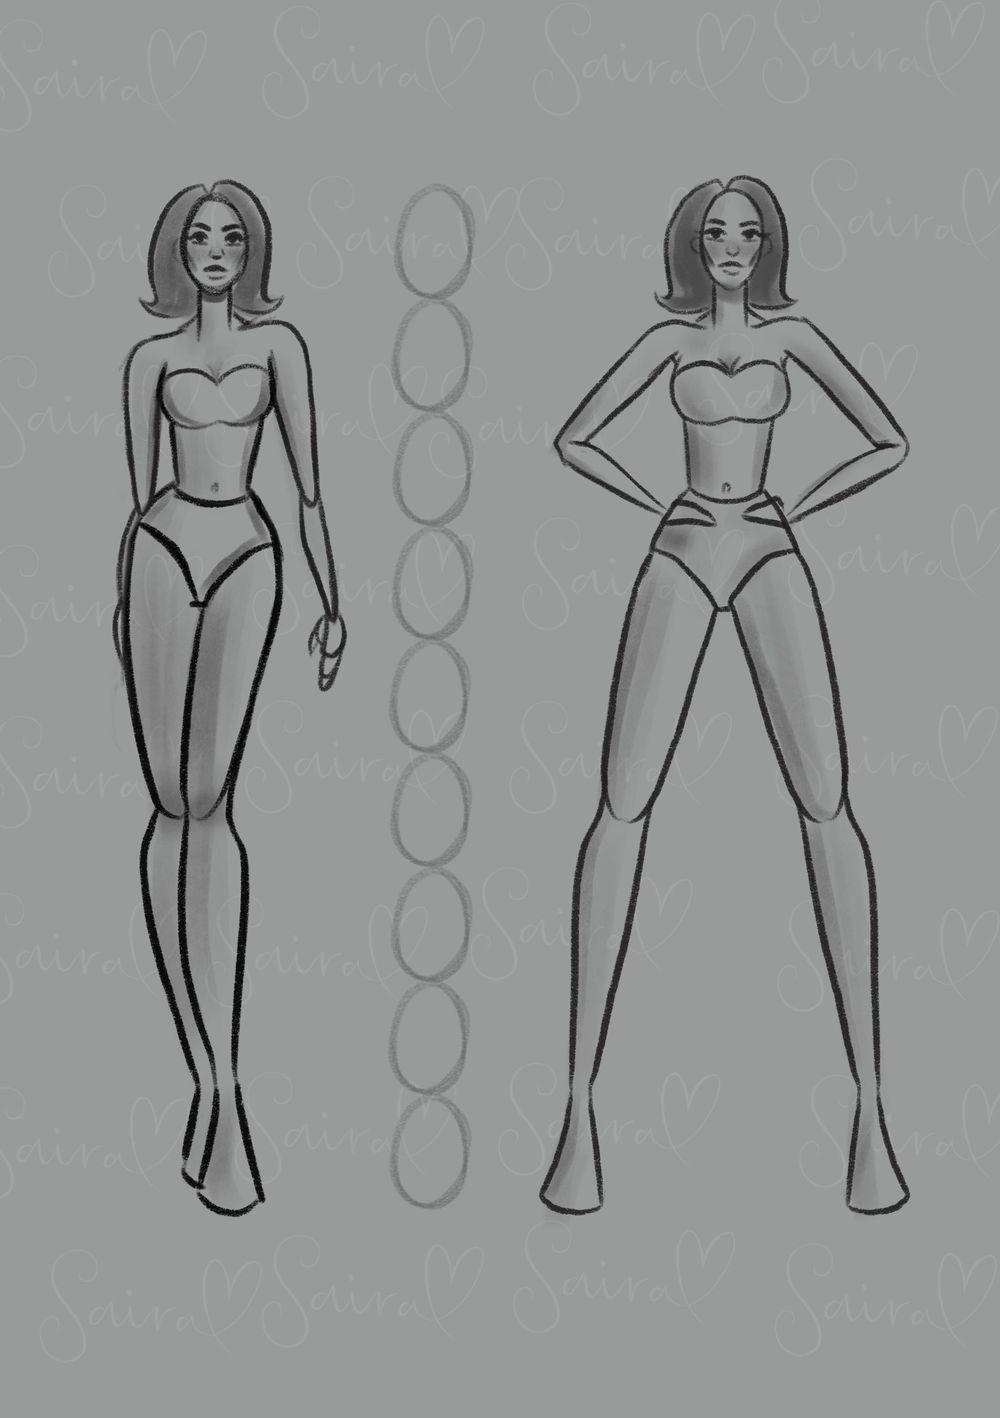 Figure drawing - Fashion illustration. - image 1 - student project